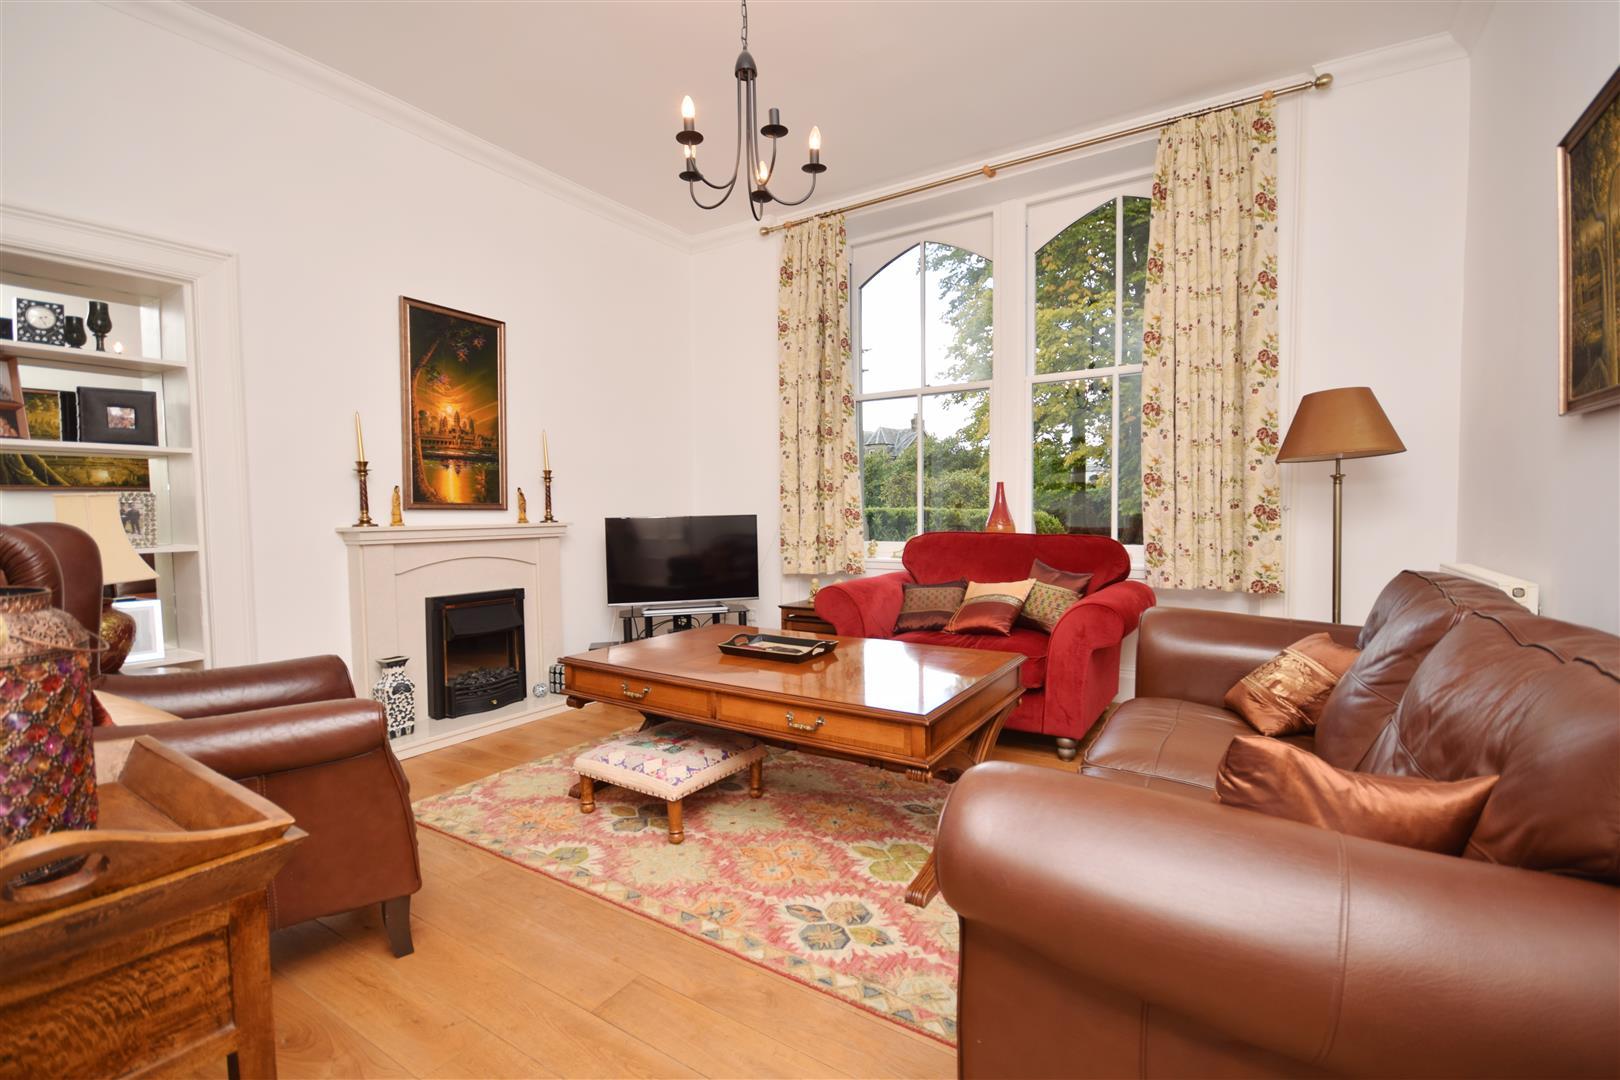 Flat 4, Croftweit, Strathearn Terrace, Crieff, Perthshire, PH7 3AQ, UK